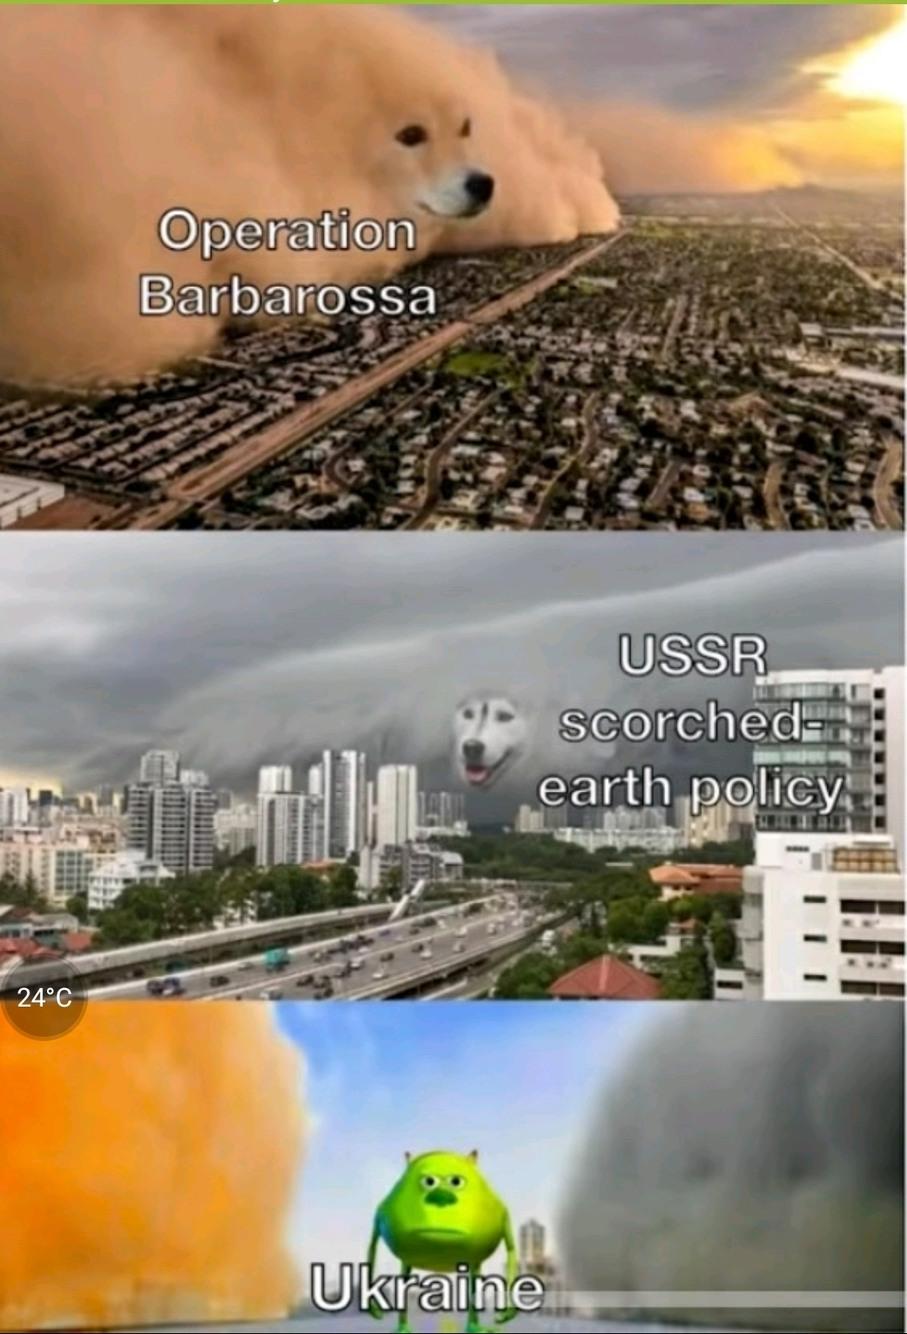 Live of the Ukrainian - meme